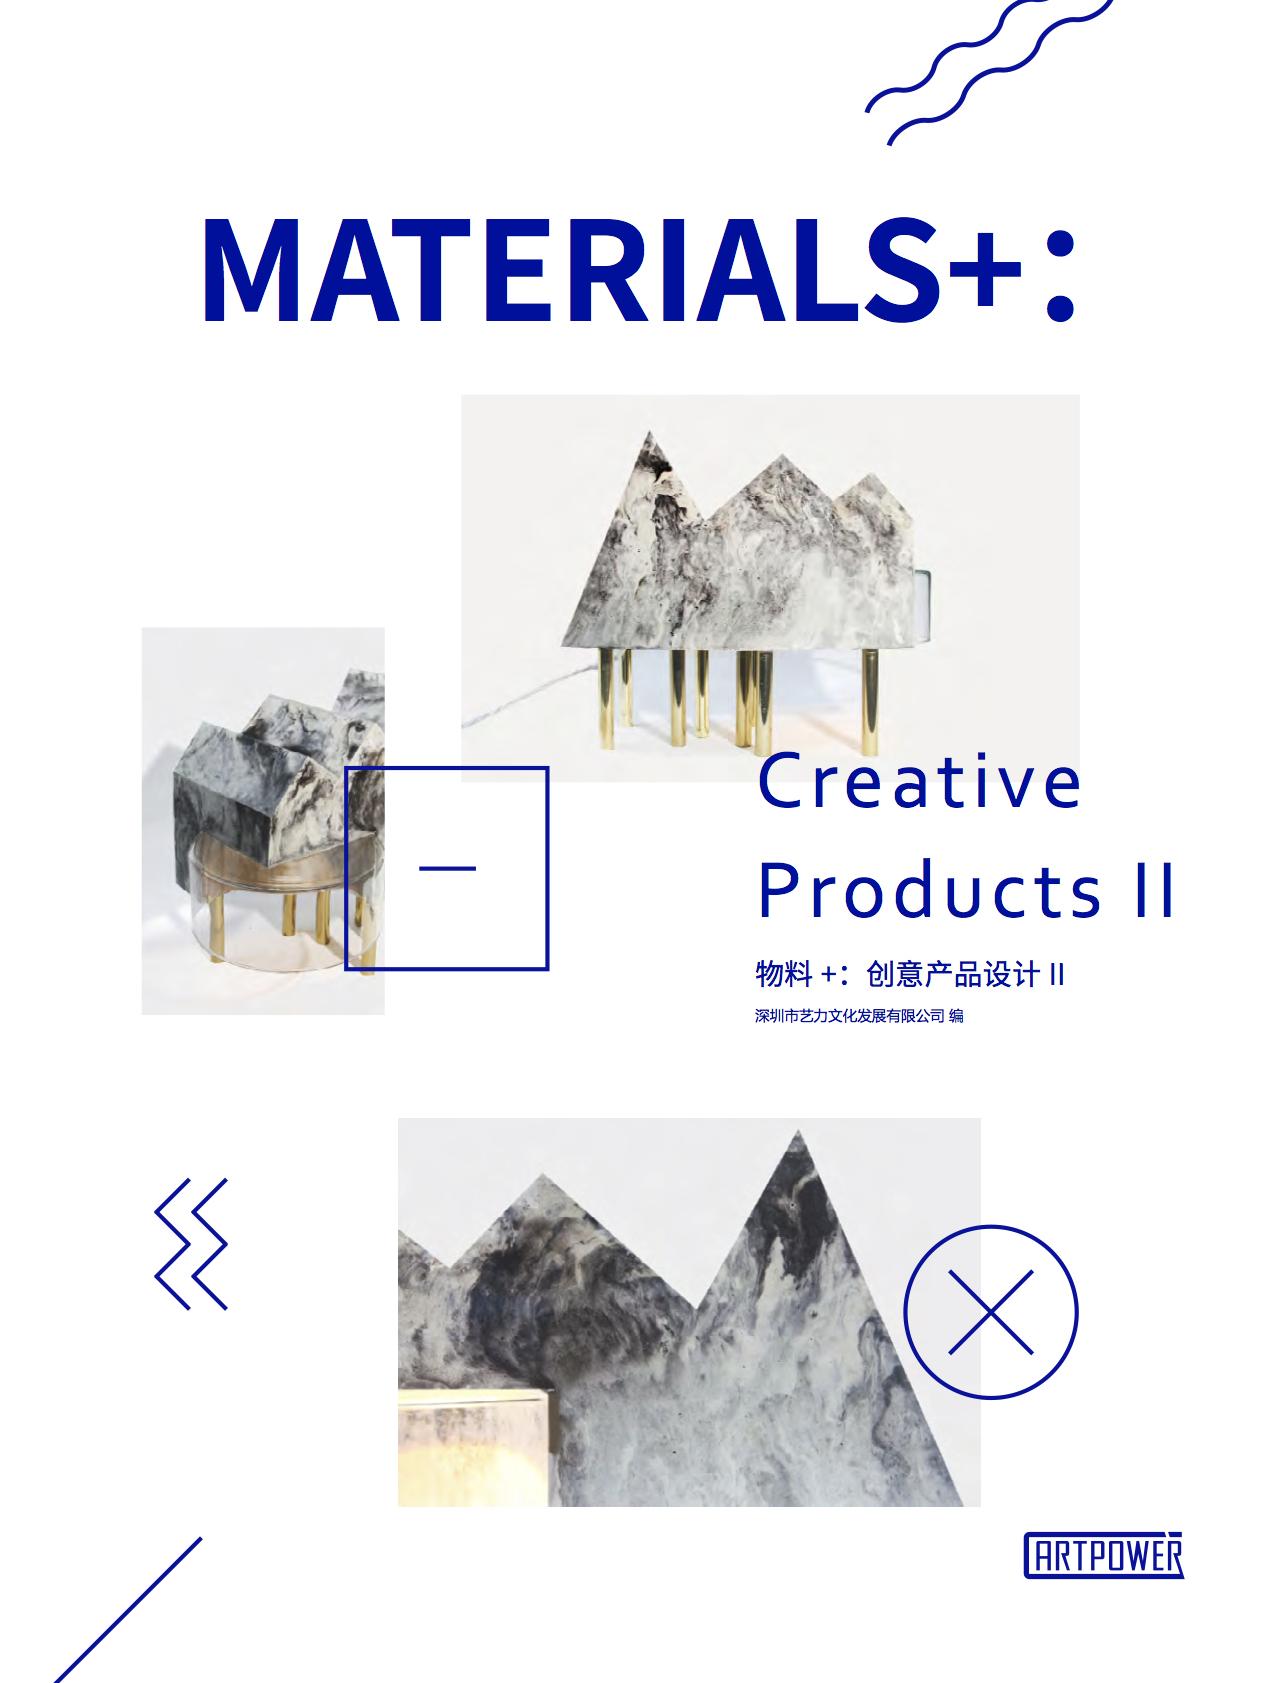 【0330】Materials+ Creative Products II.jpg